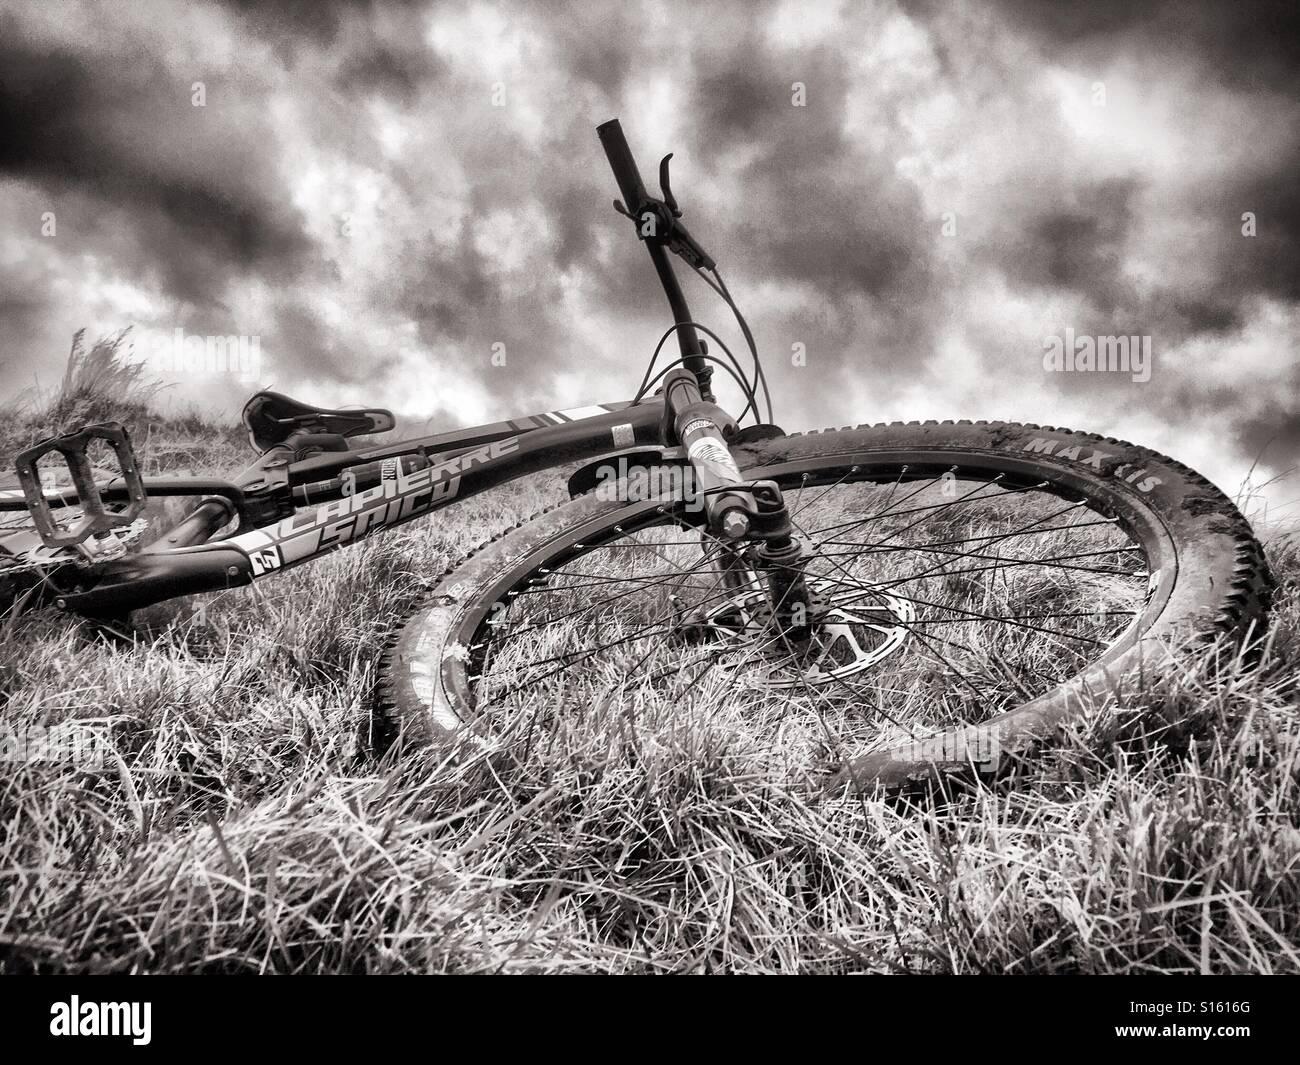 A full suspension mountain bike - Stock Image